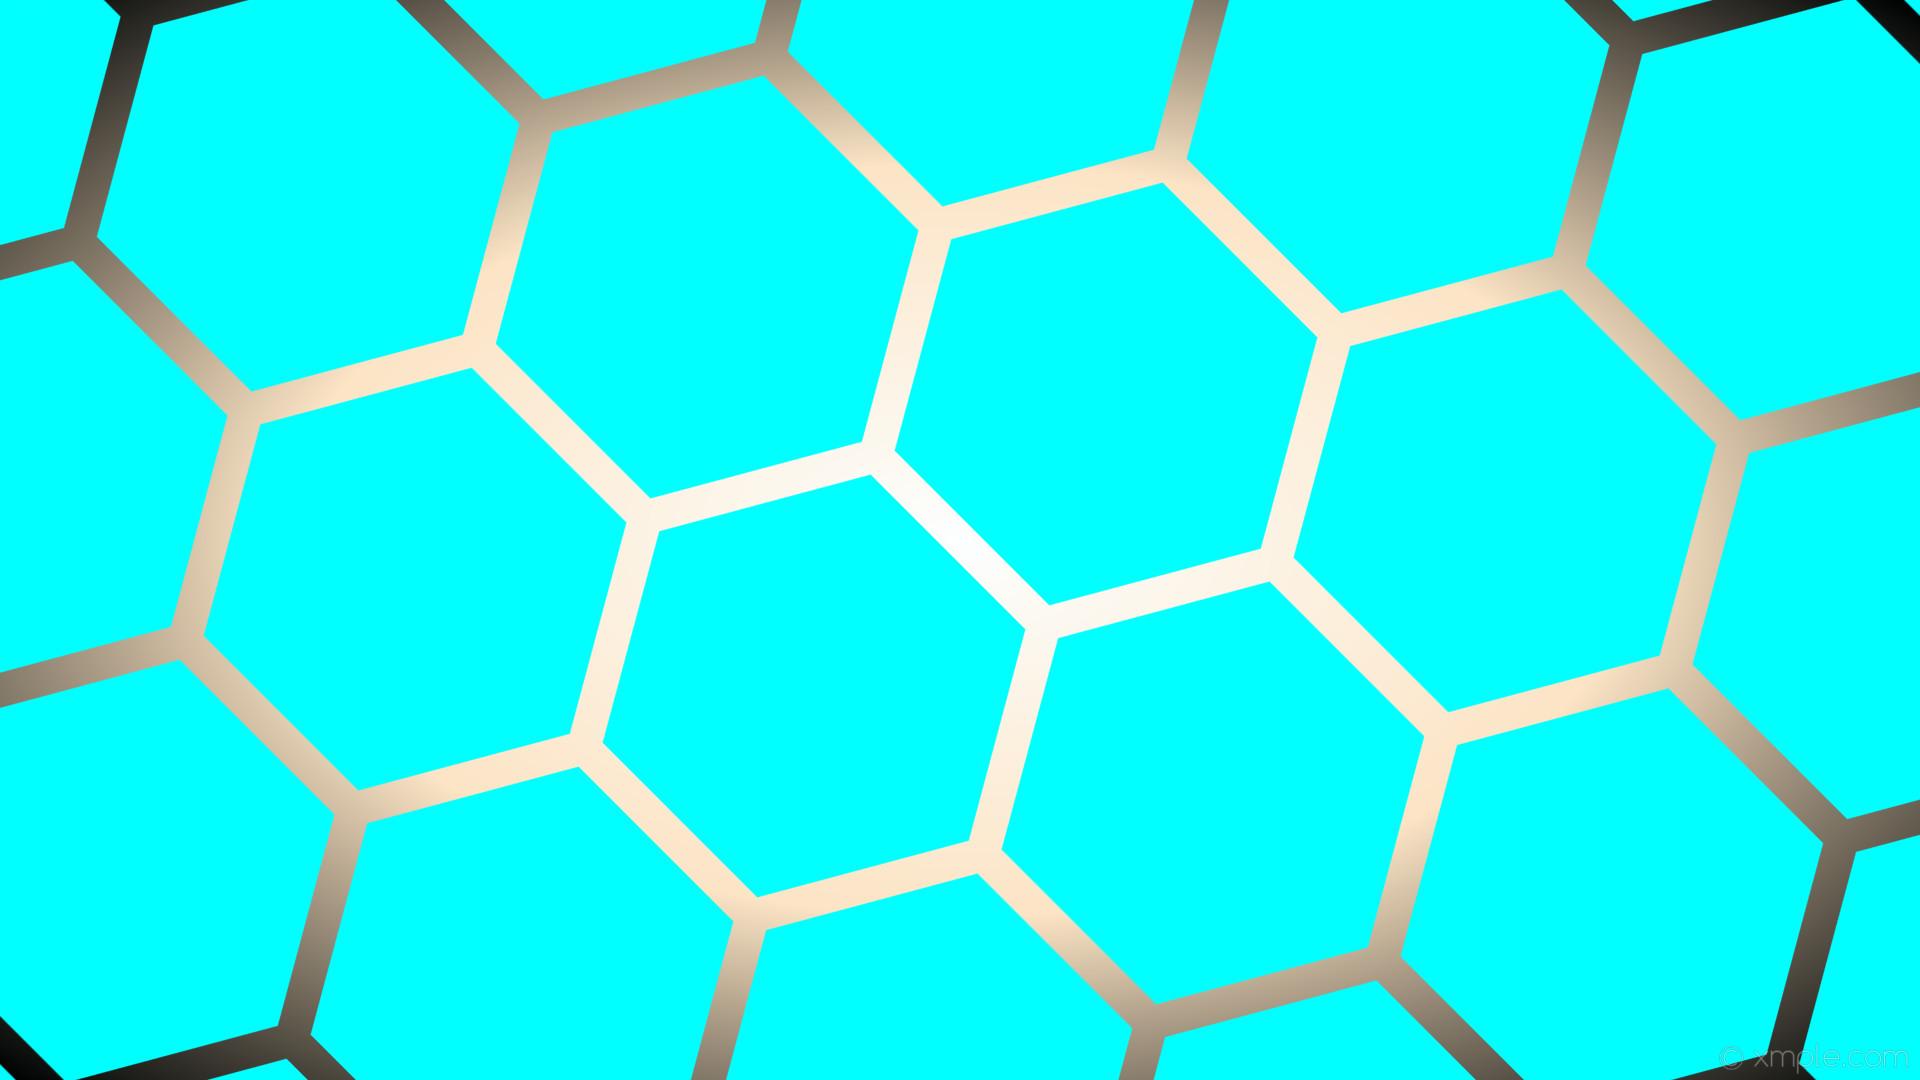 Res: 1920x1080, wallpaper glow brown blue hexagon gradient white black aqua cyan bisque  #00ffff #ffffff #